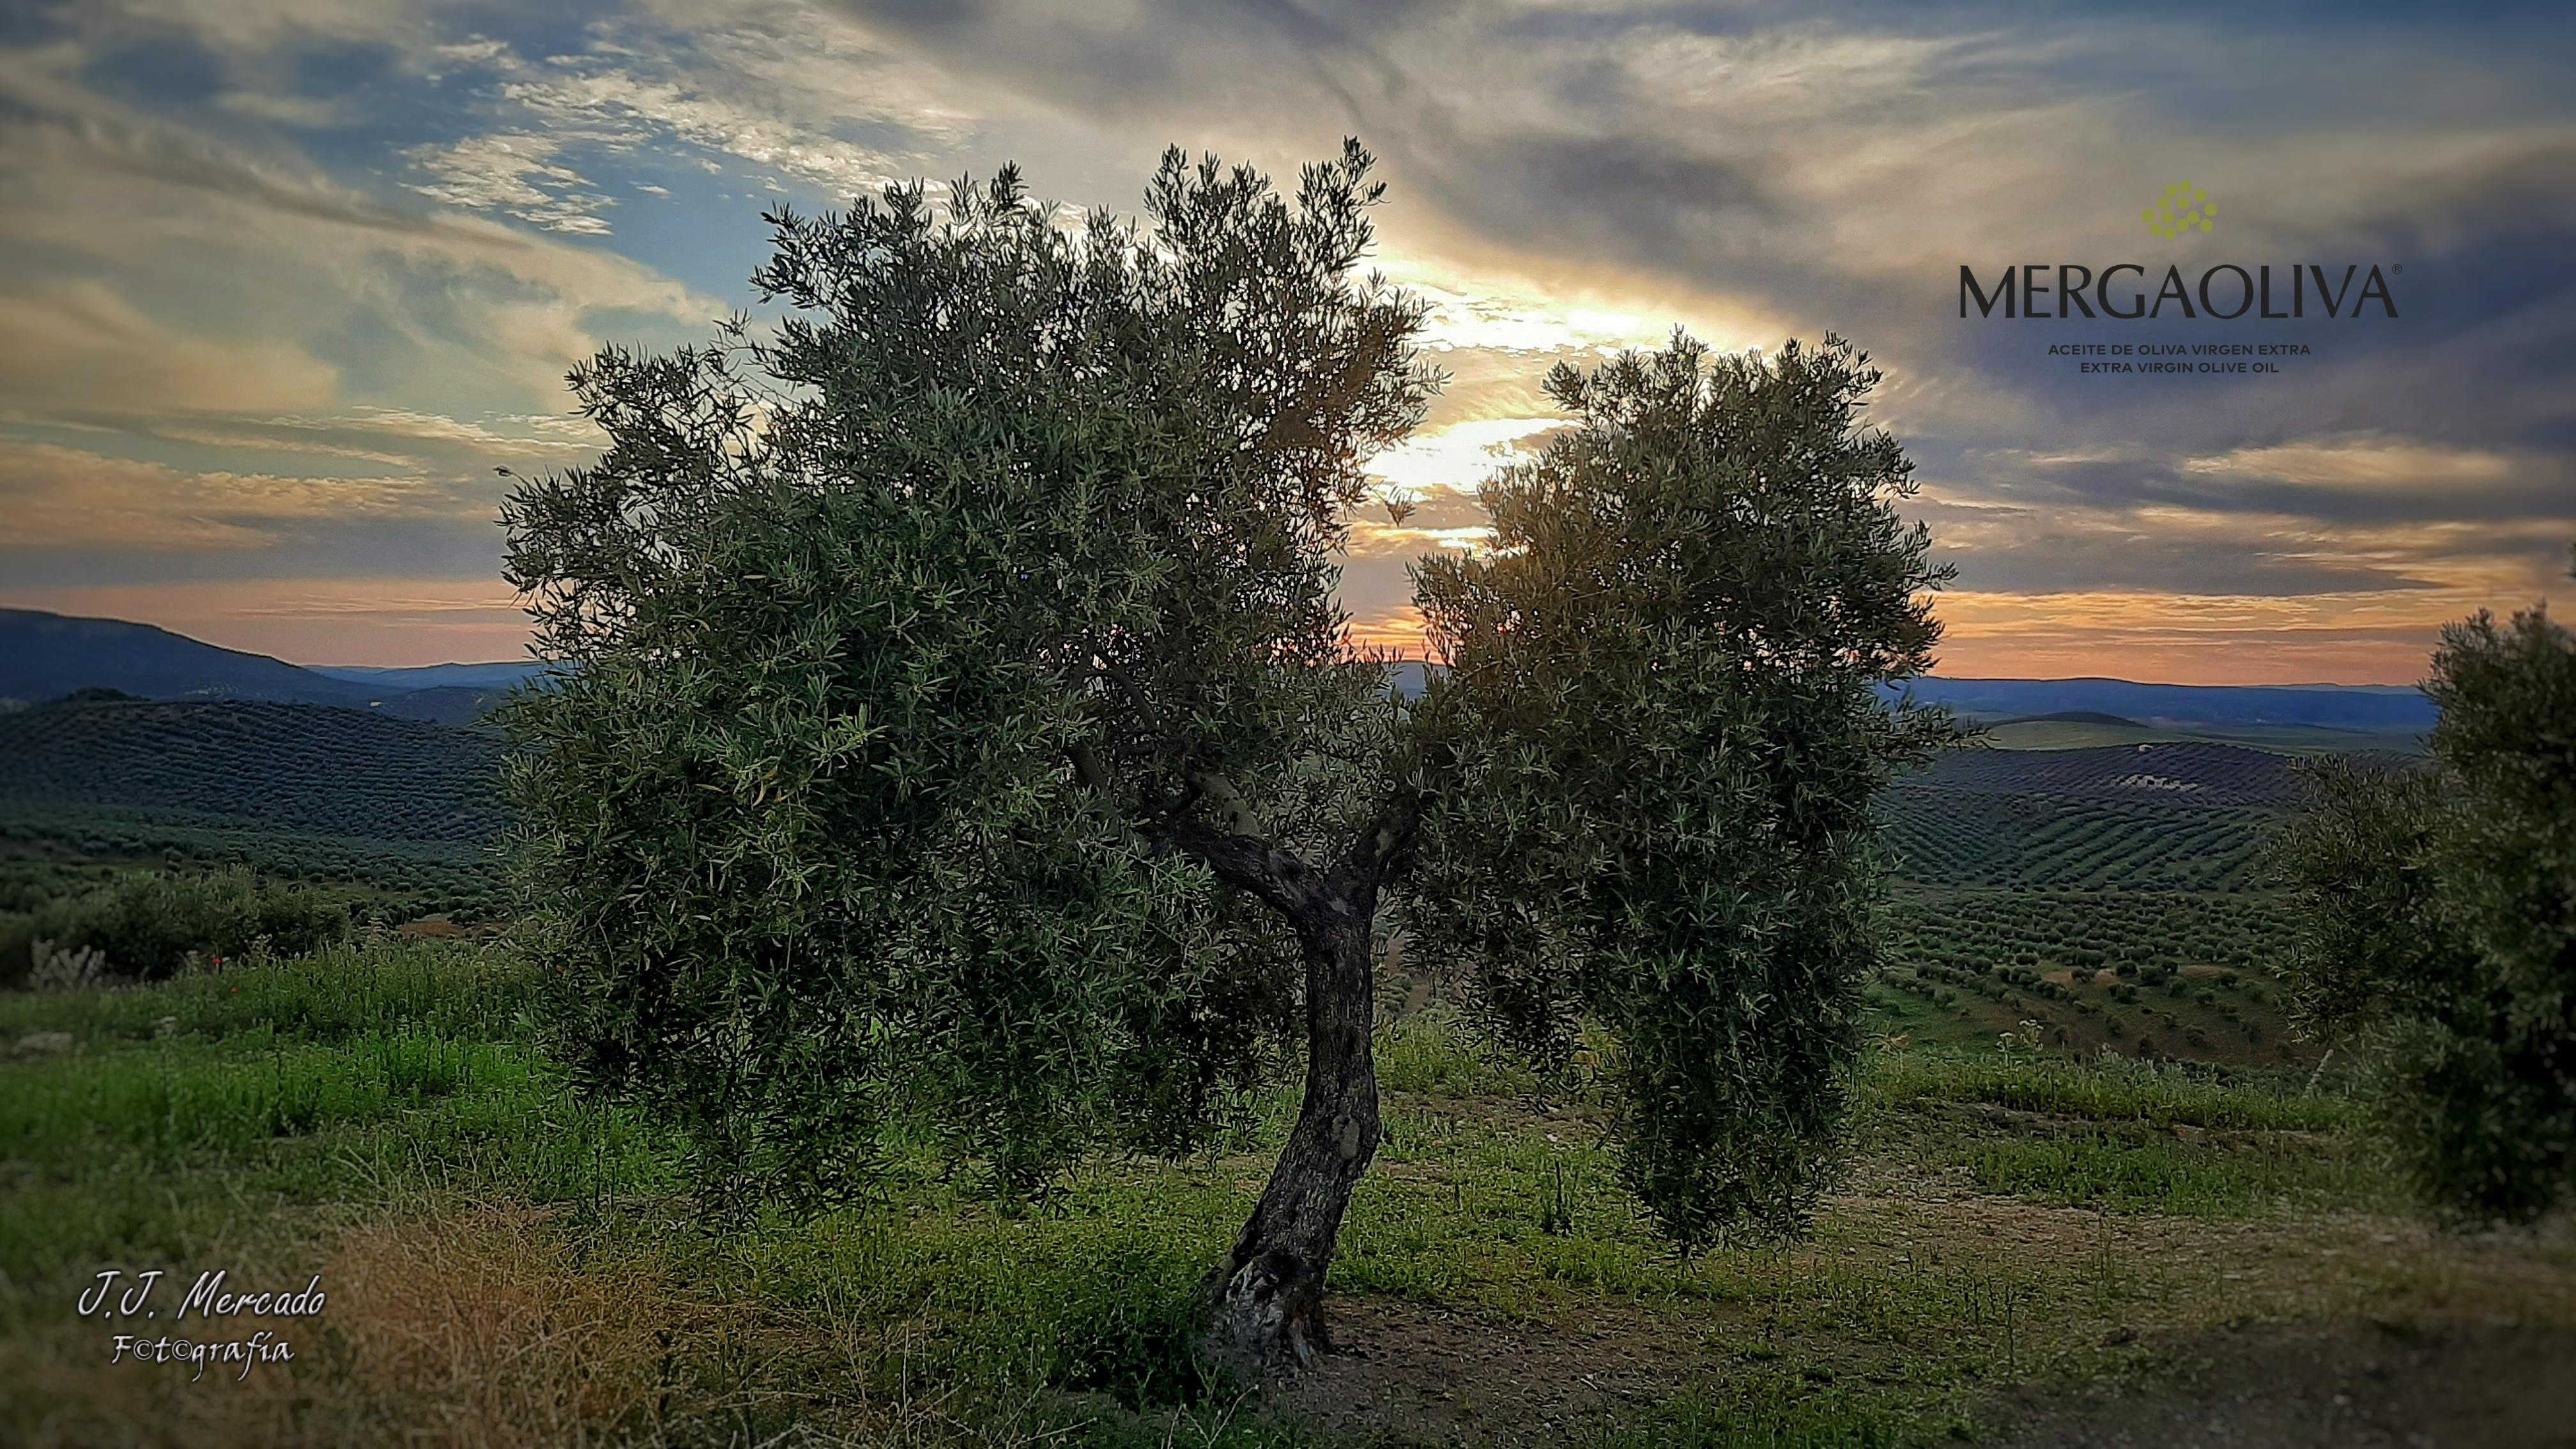 Mergaoliva: Olive grove in Jaén.